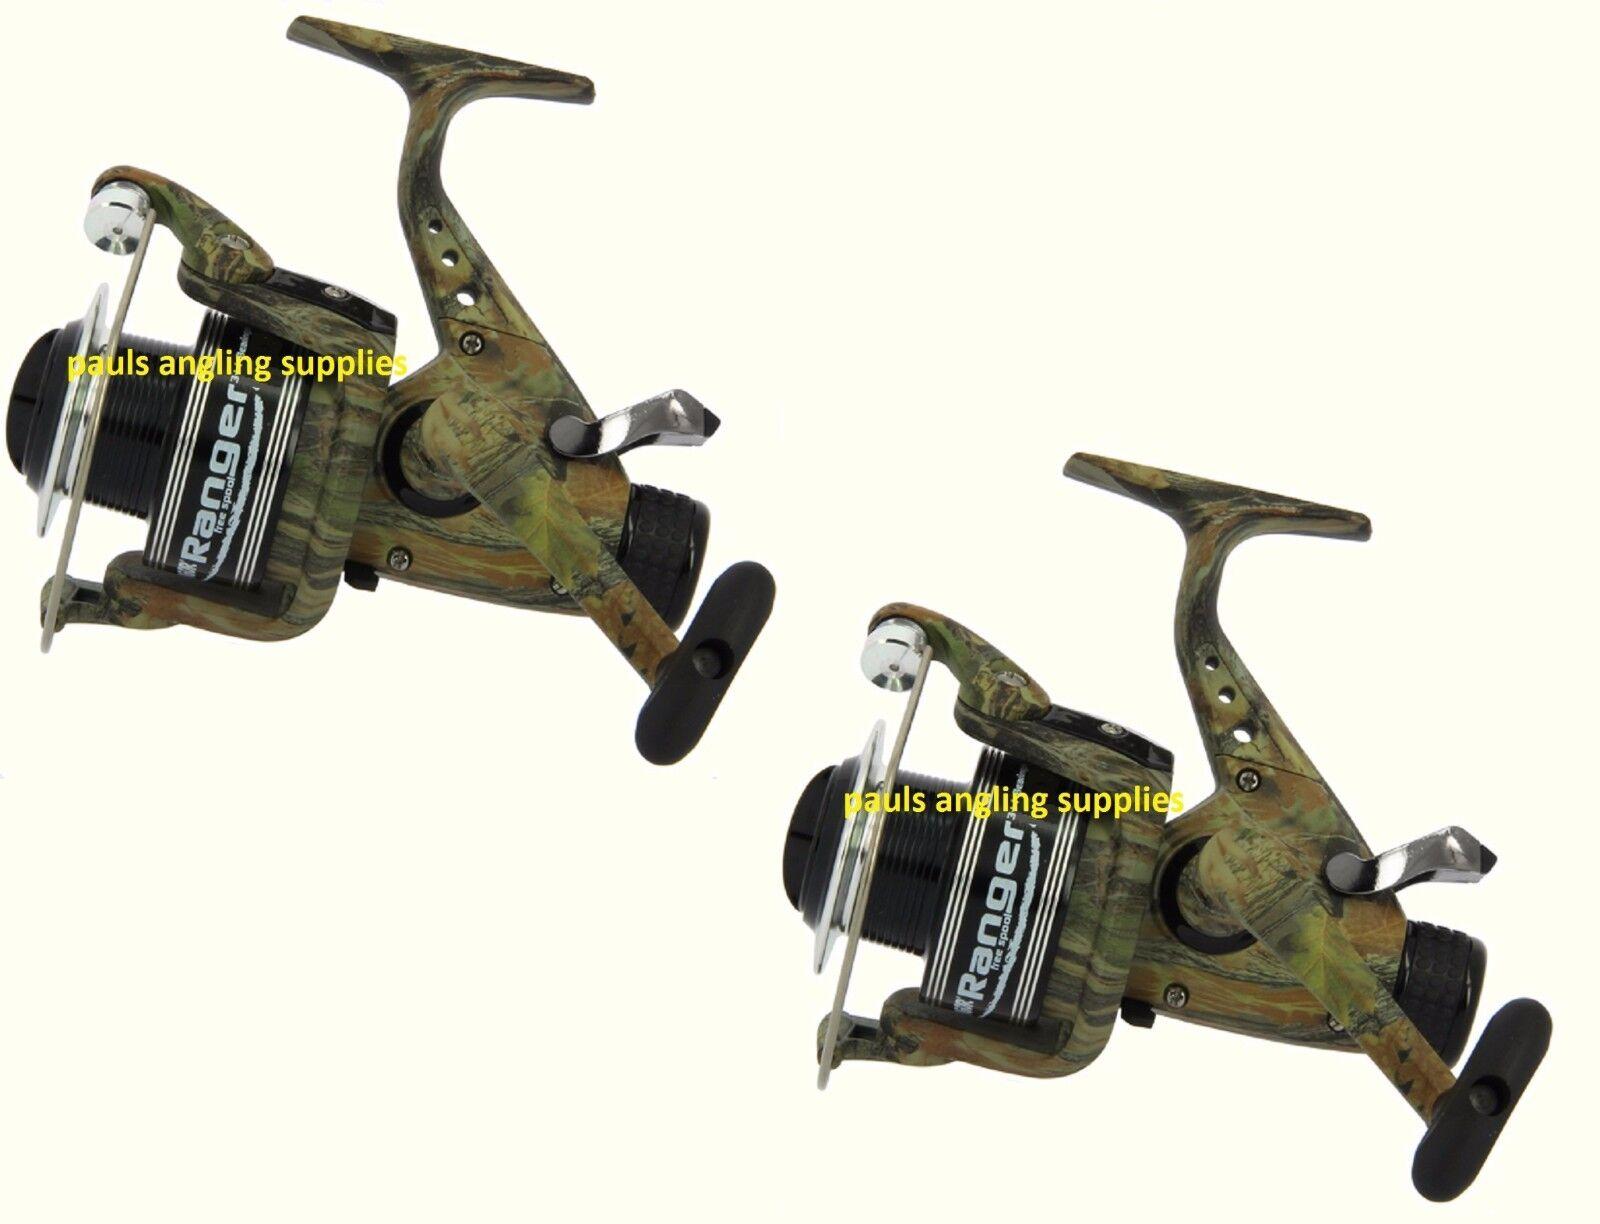 2 x Ranger CAMO Freespool Carp Fishing Reels Bait, Switch 060 Size